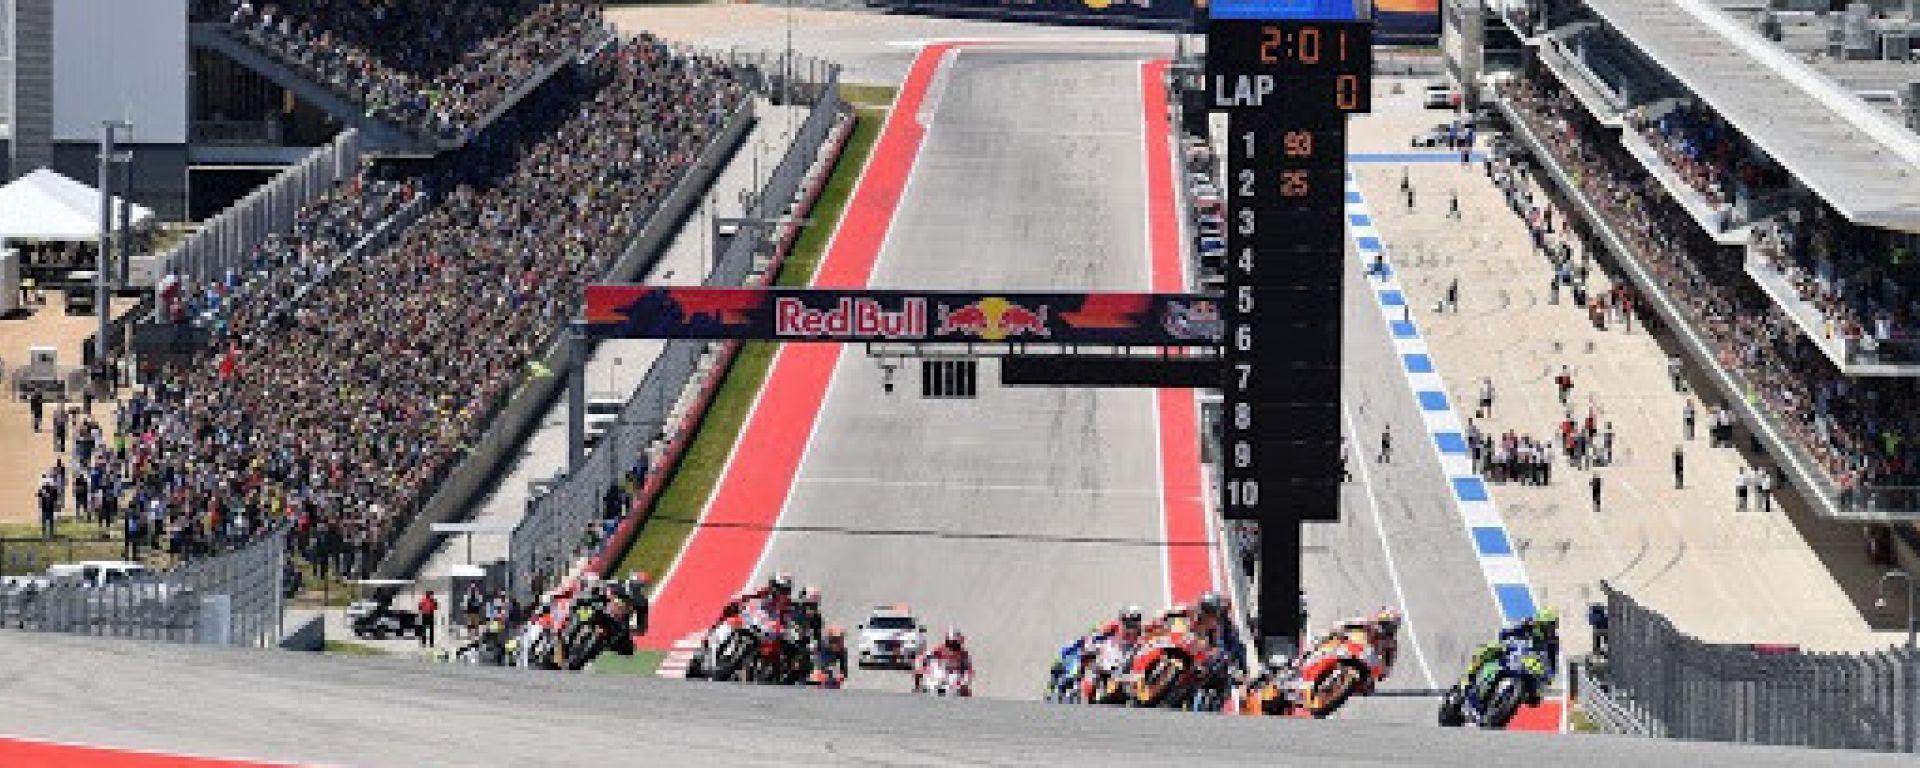 MotoGP Stati Uniti 2018, Austin, partenza